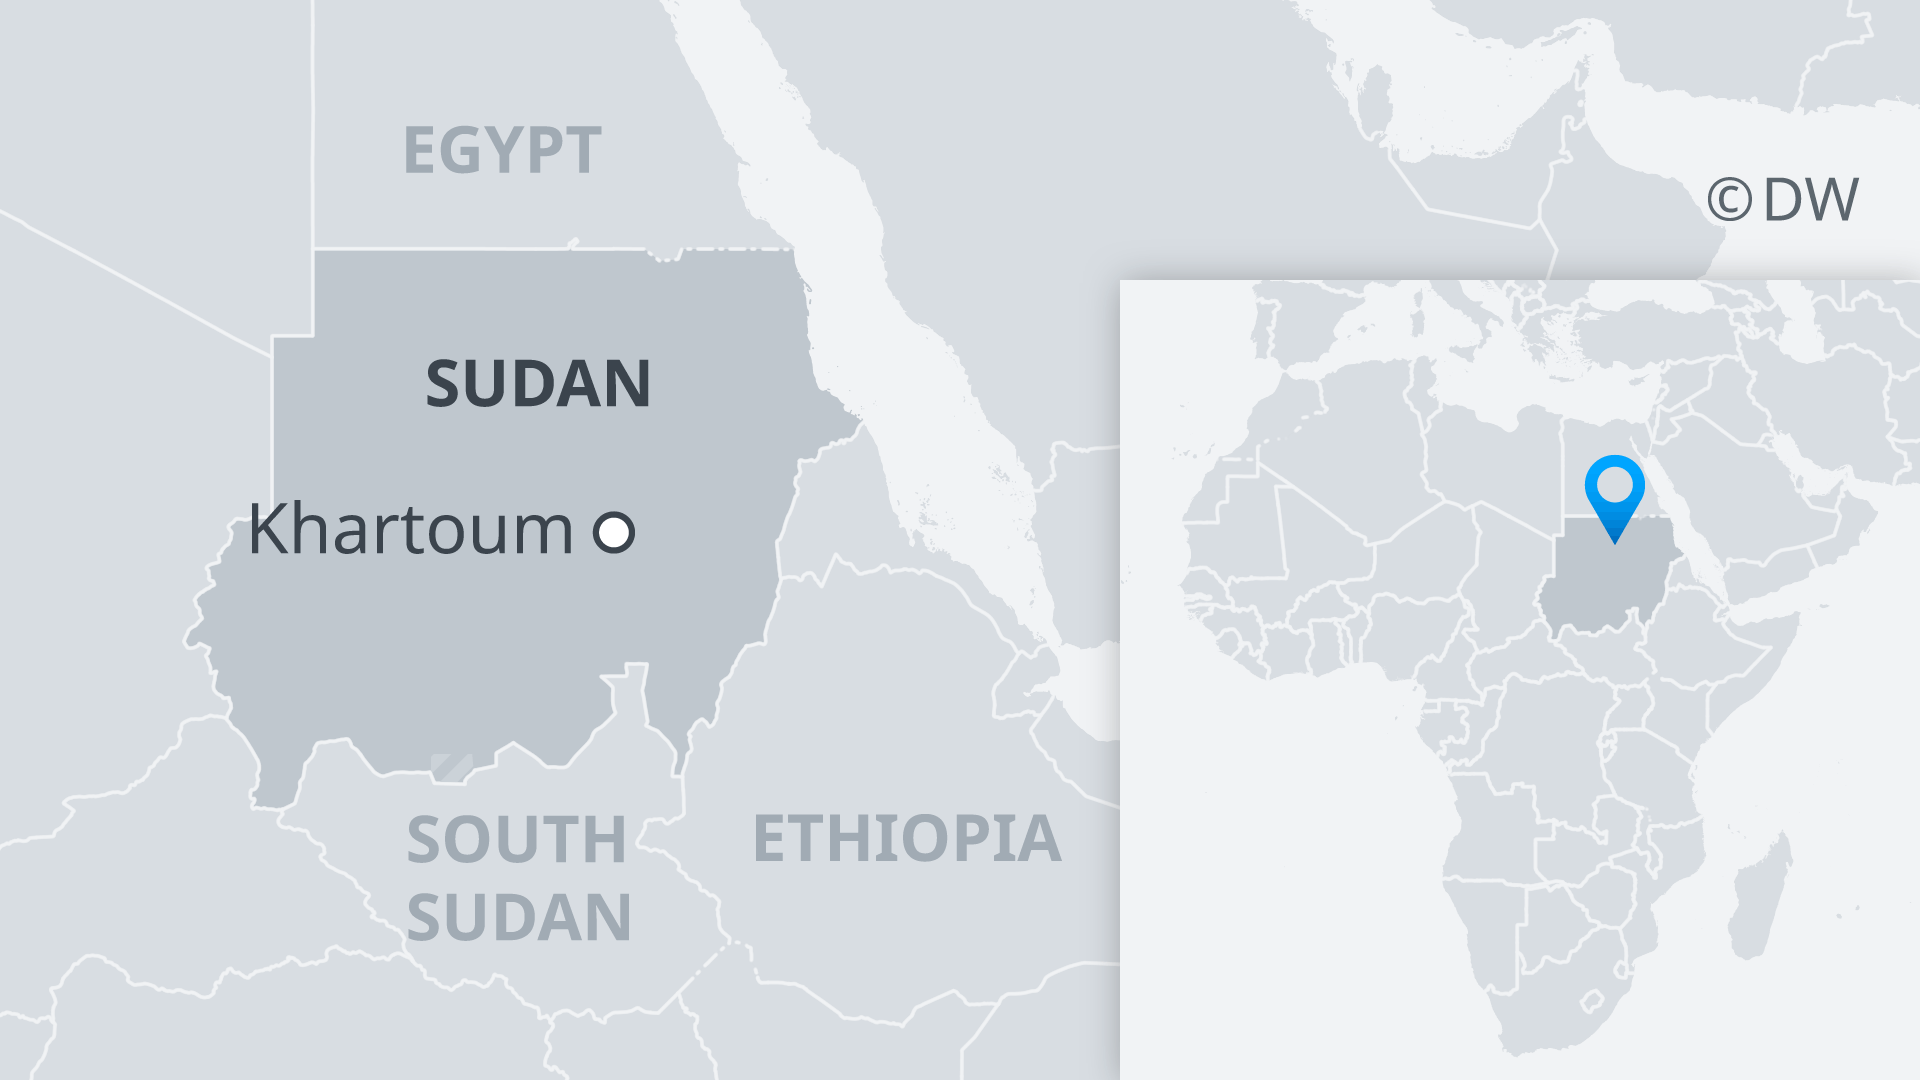 Map showing Sudanese capital Khartoum